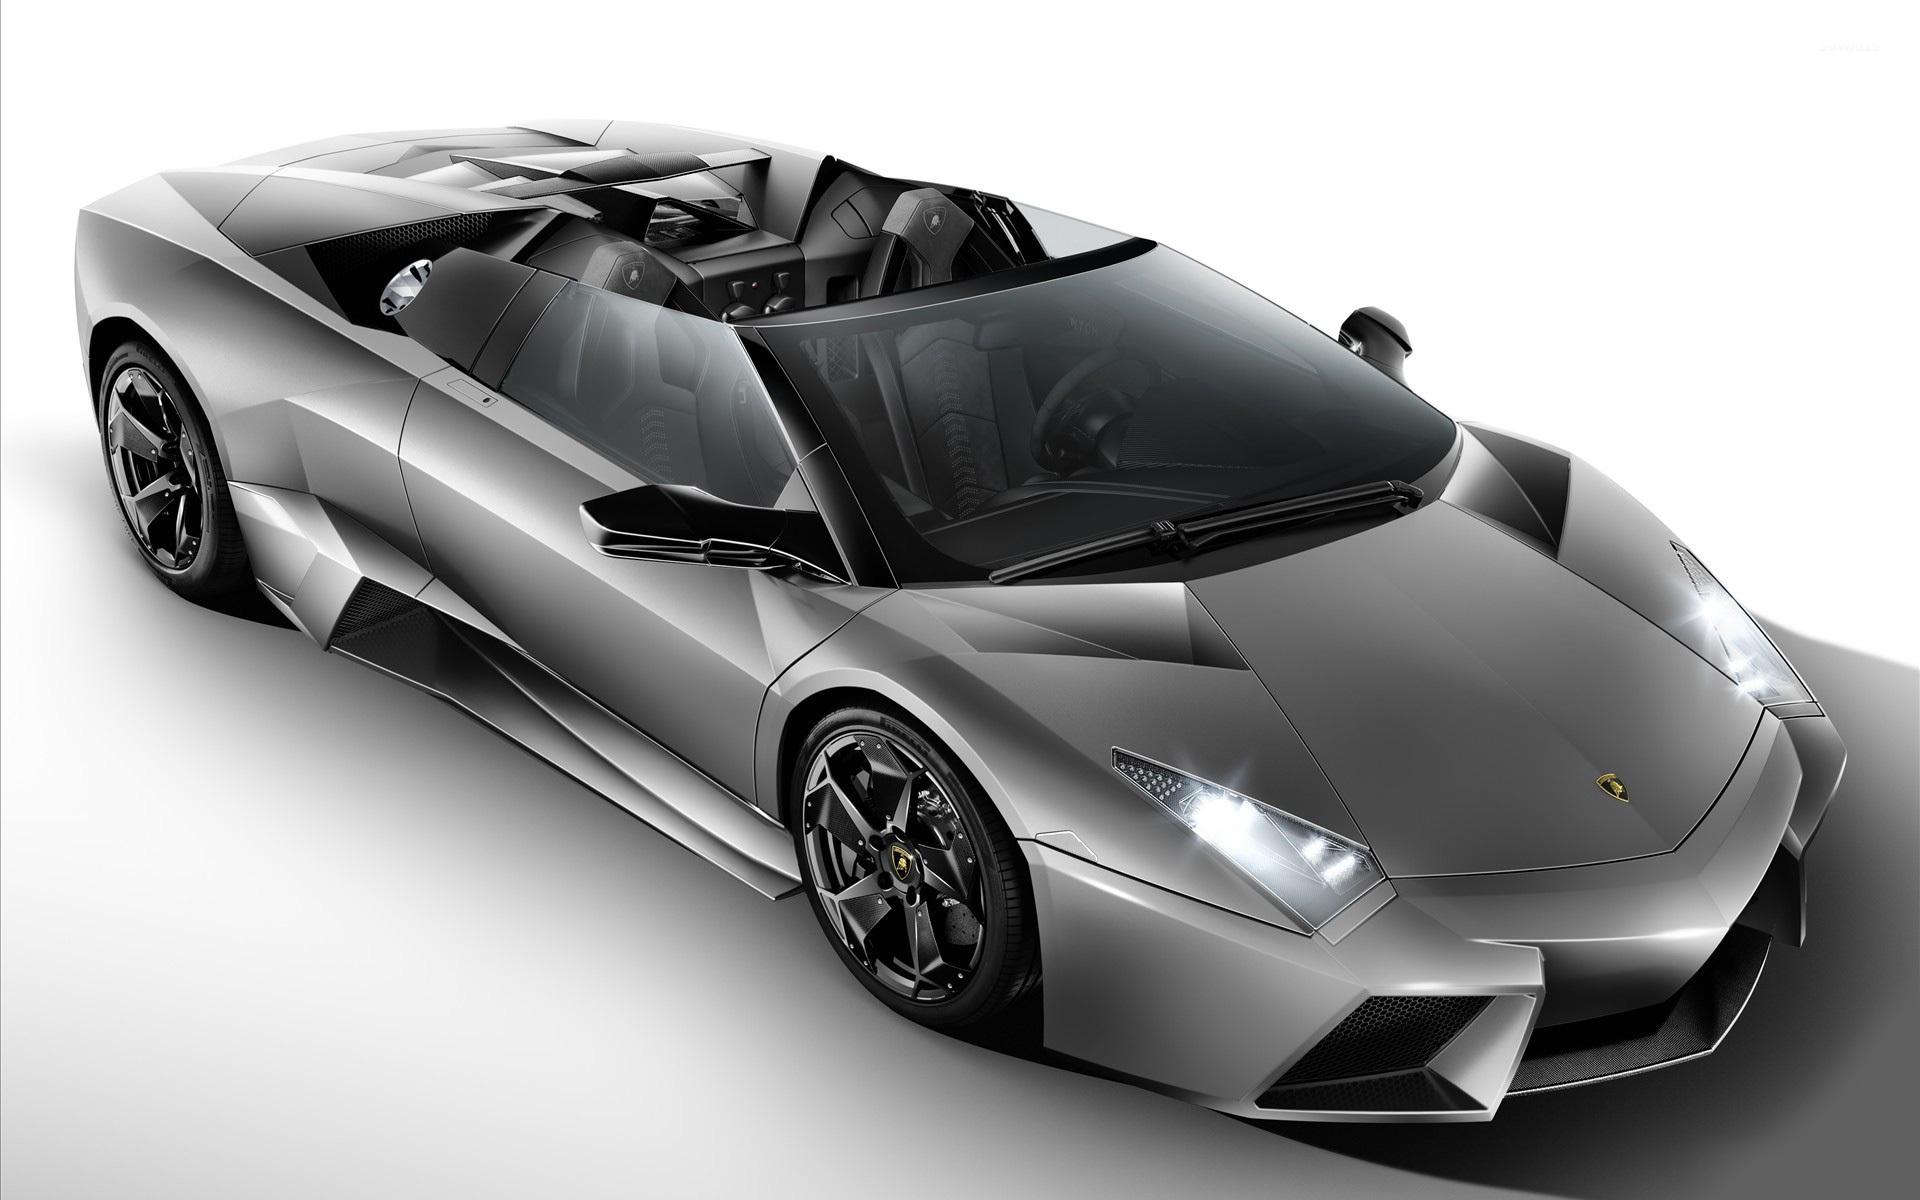 Lamborghini Reventon 3 Wallpaper Car Wallpapers 7653